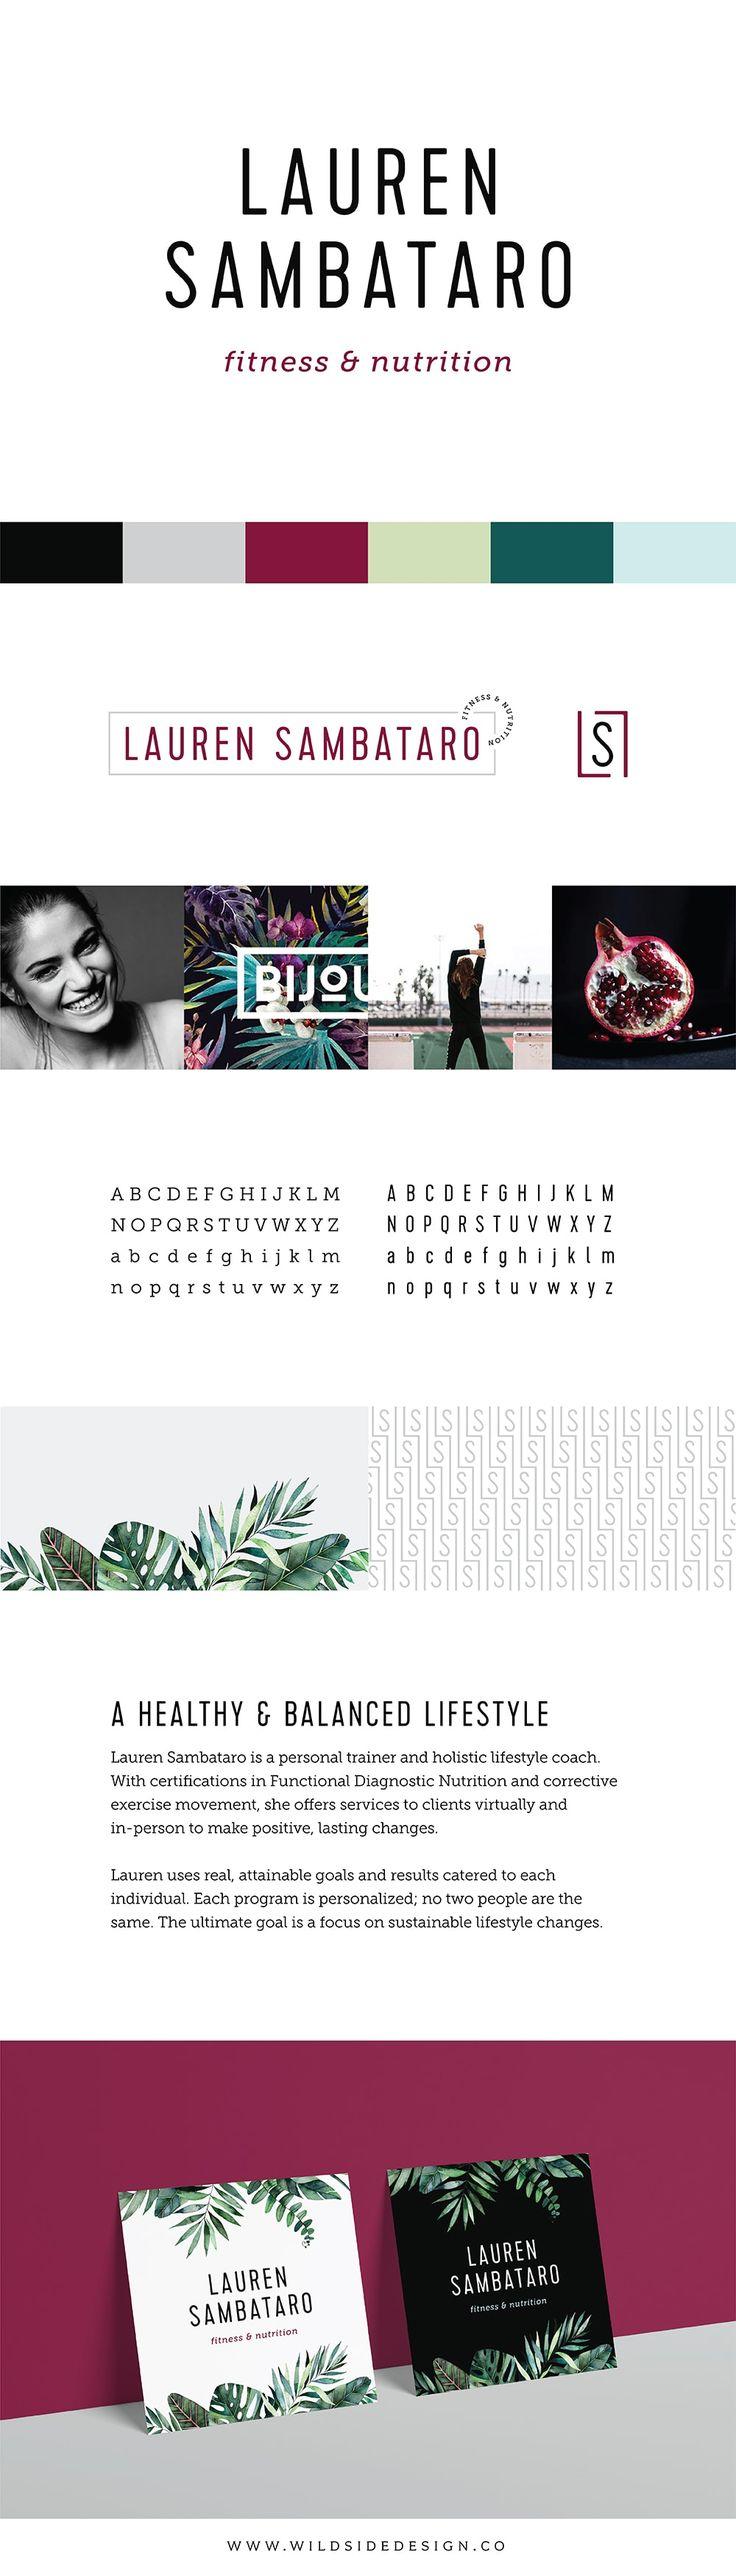 Bold Minimalist Brand Design for Lauren Sambataro Fitness & Nutrition | Wild Side Design Co.